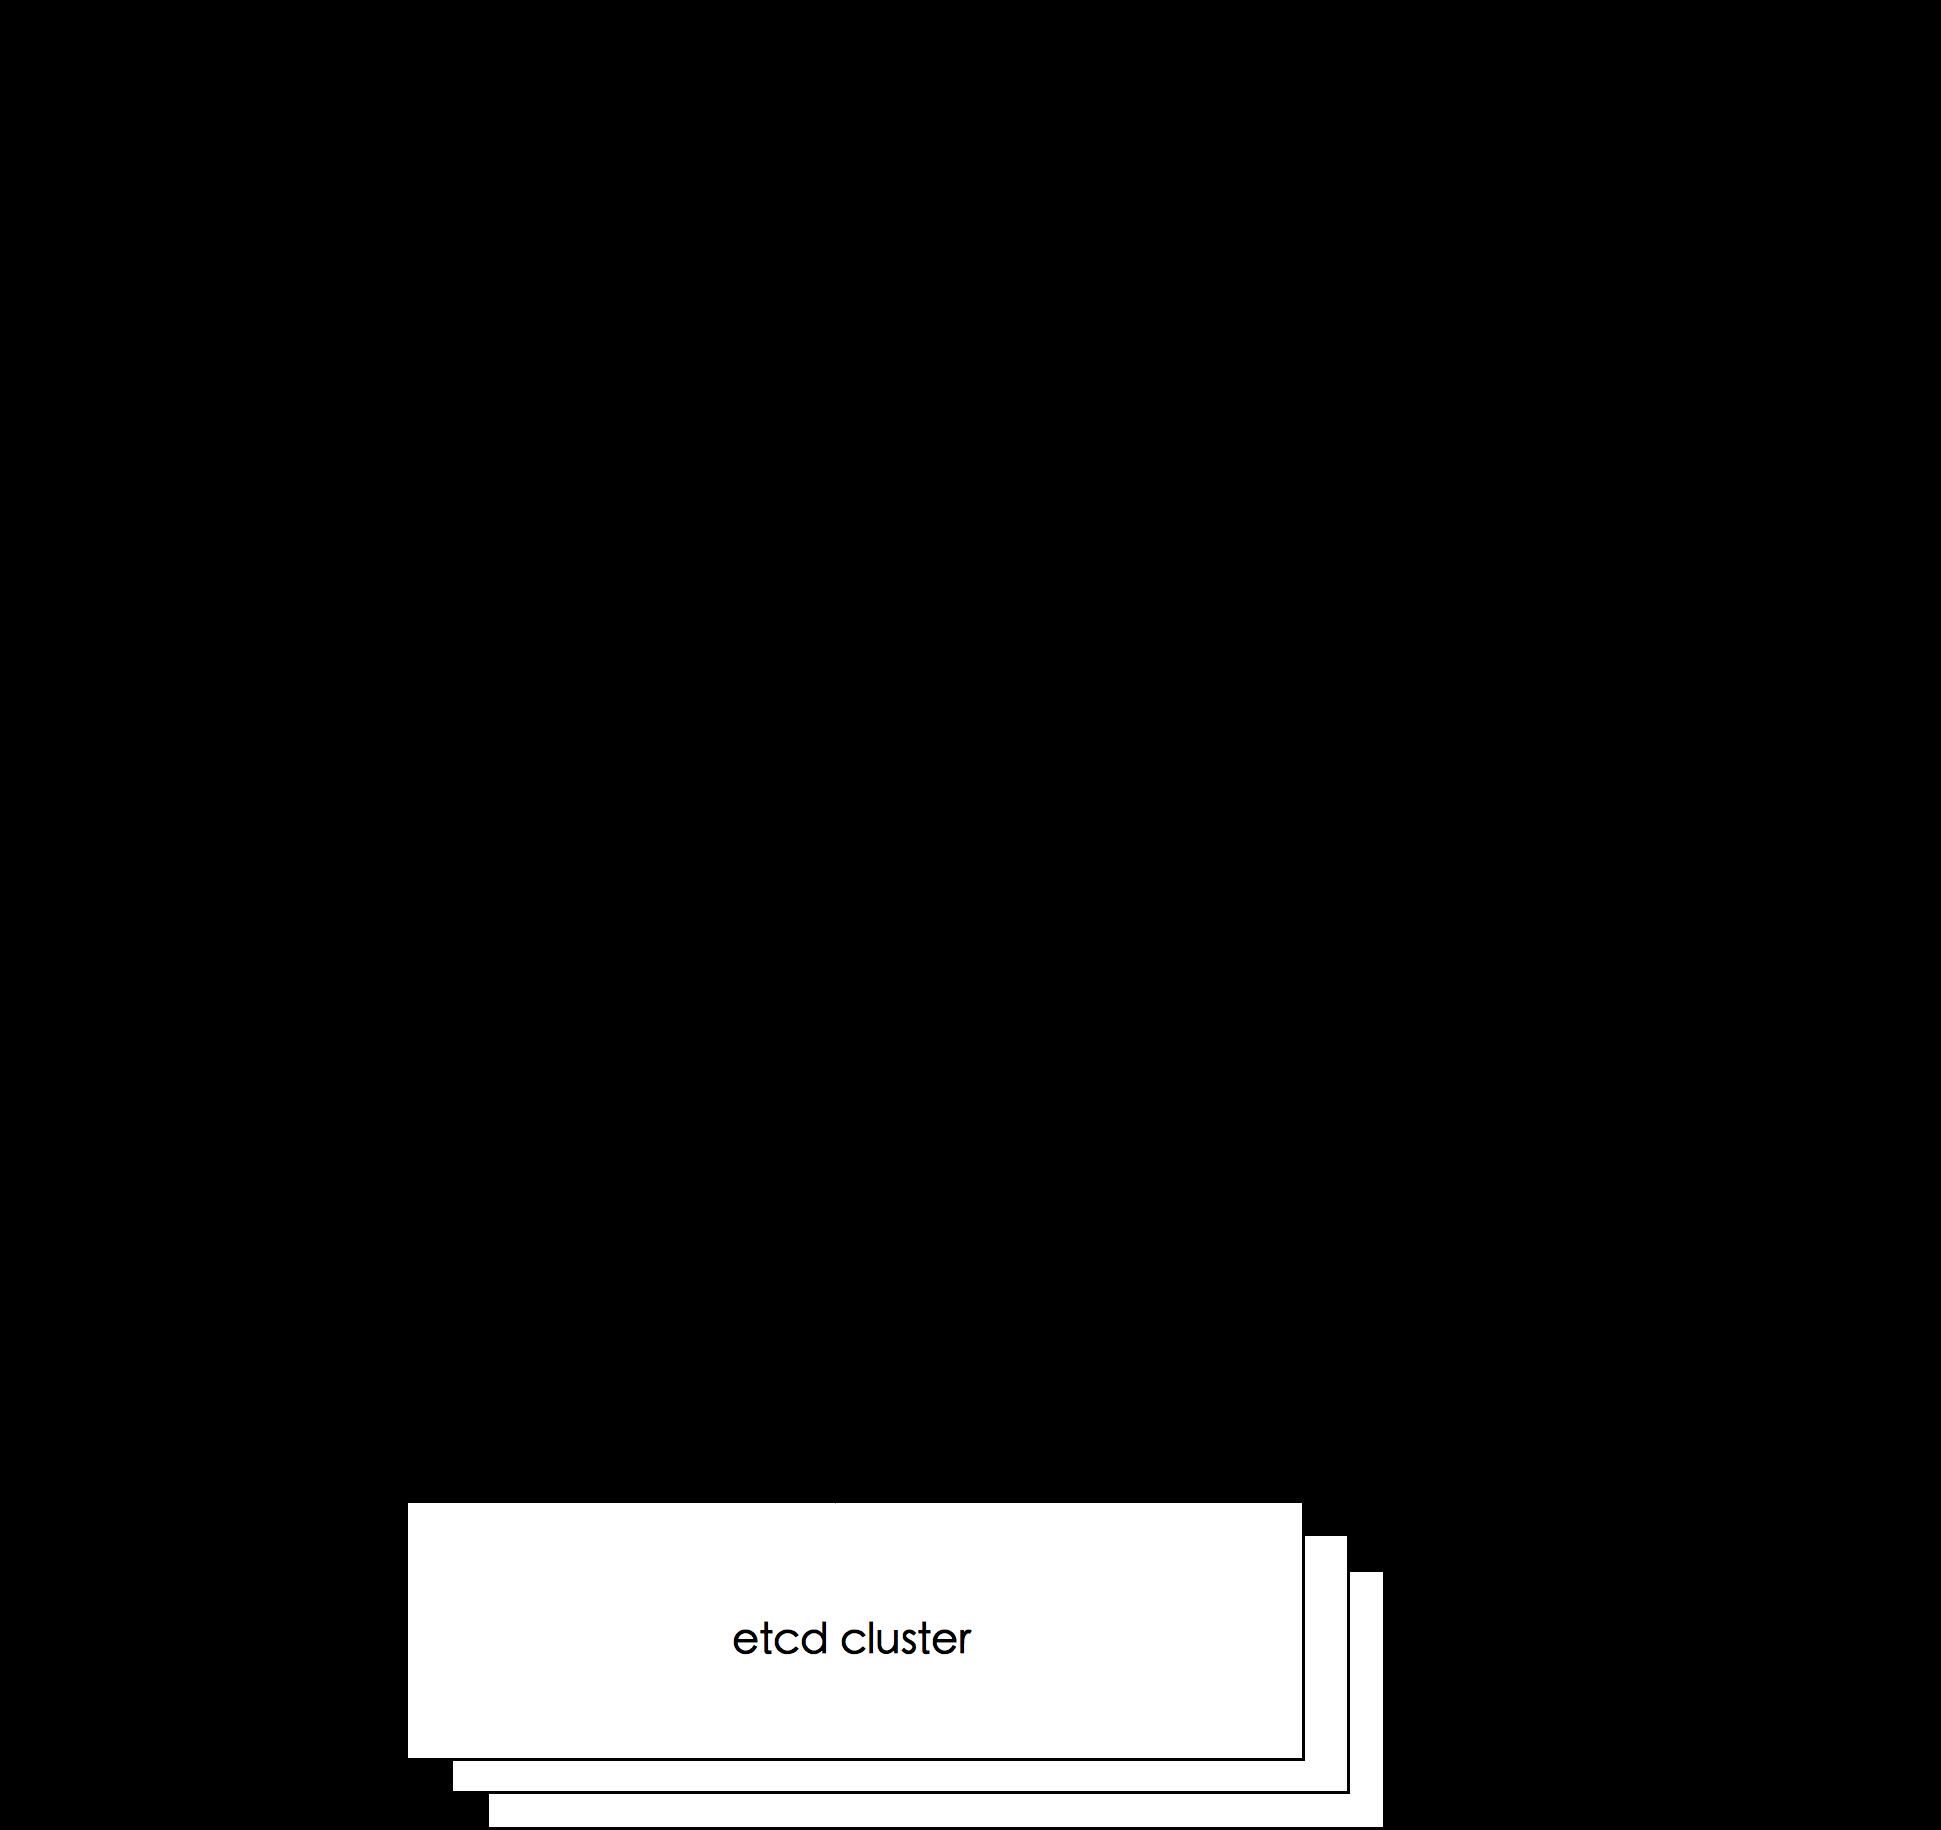 一文读懂 Kubernetes APIServer 原理